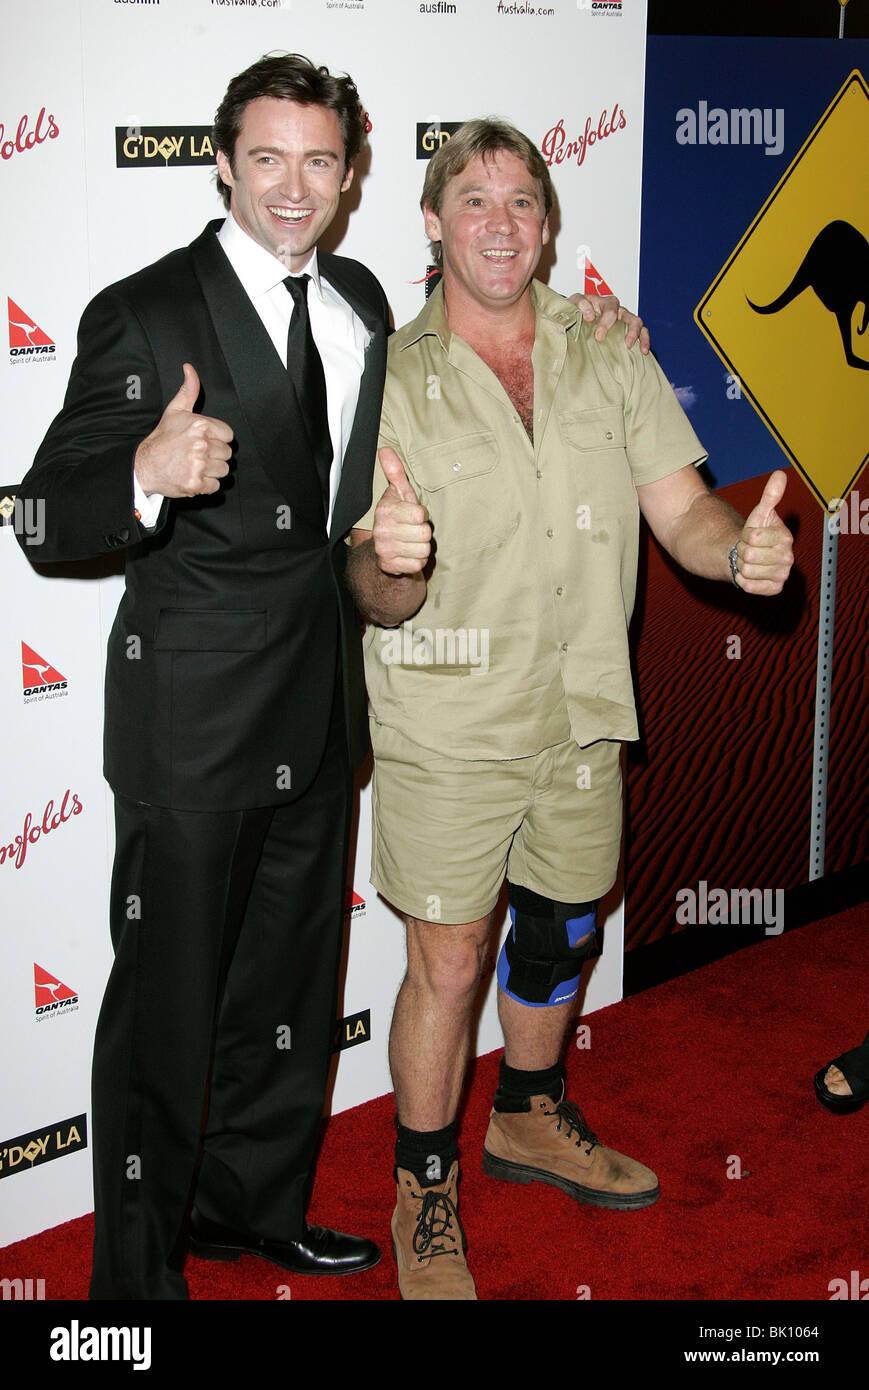 HUGH JACKMAN & STEVE IRWIN G'DAY LA PENFOLDS ICON GALA HOLLYWOOD PALADIUM LOS ANGELES USA 14 January 2006 - Stock Image